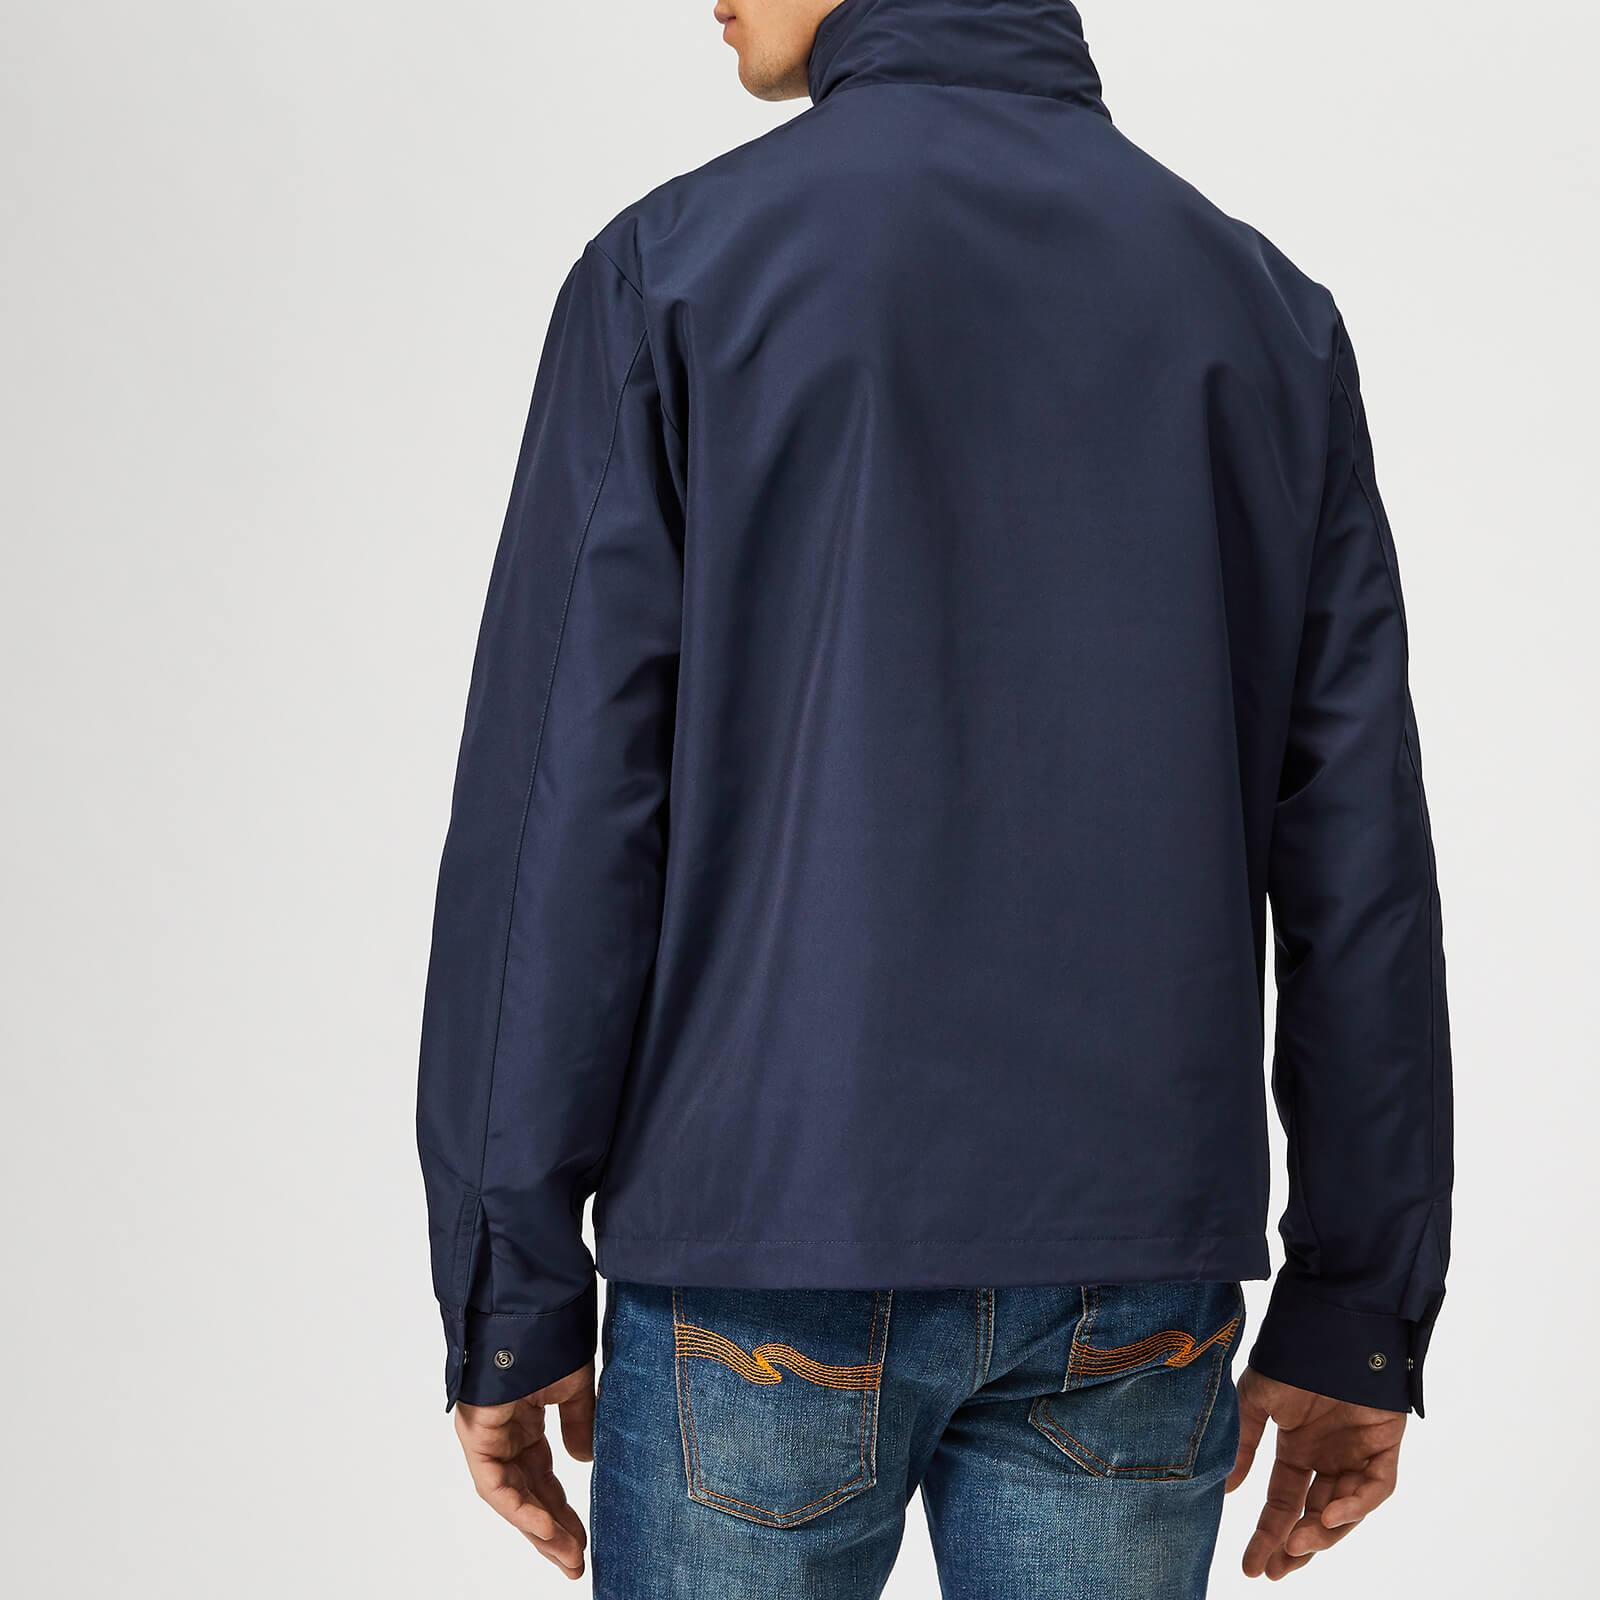 f09e392d0c0cd Lyst - Lacoste Classic Blouson Jacket in Blue for Men